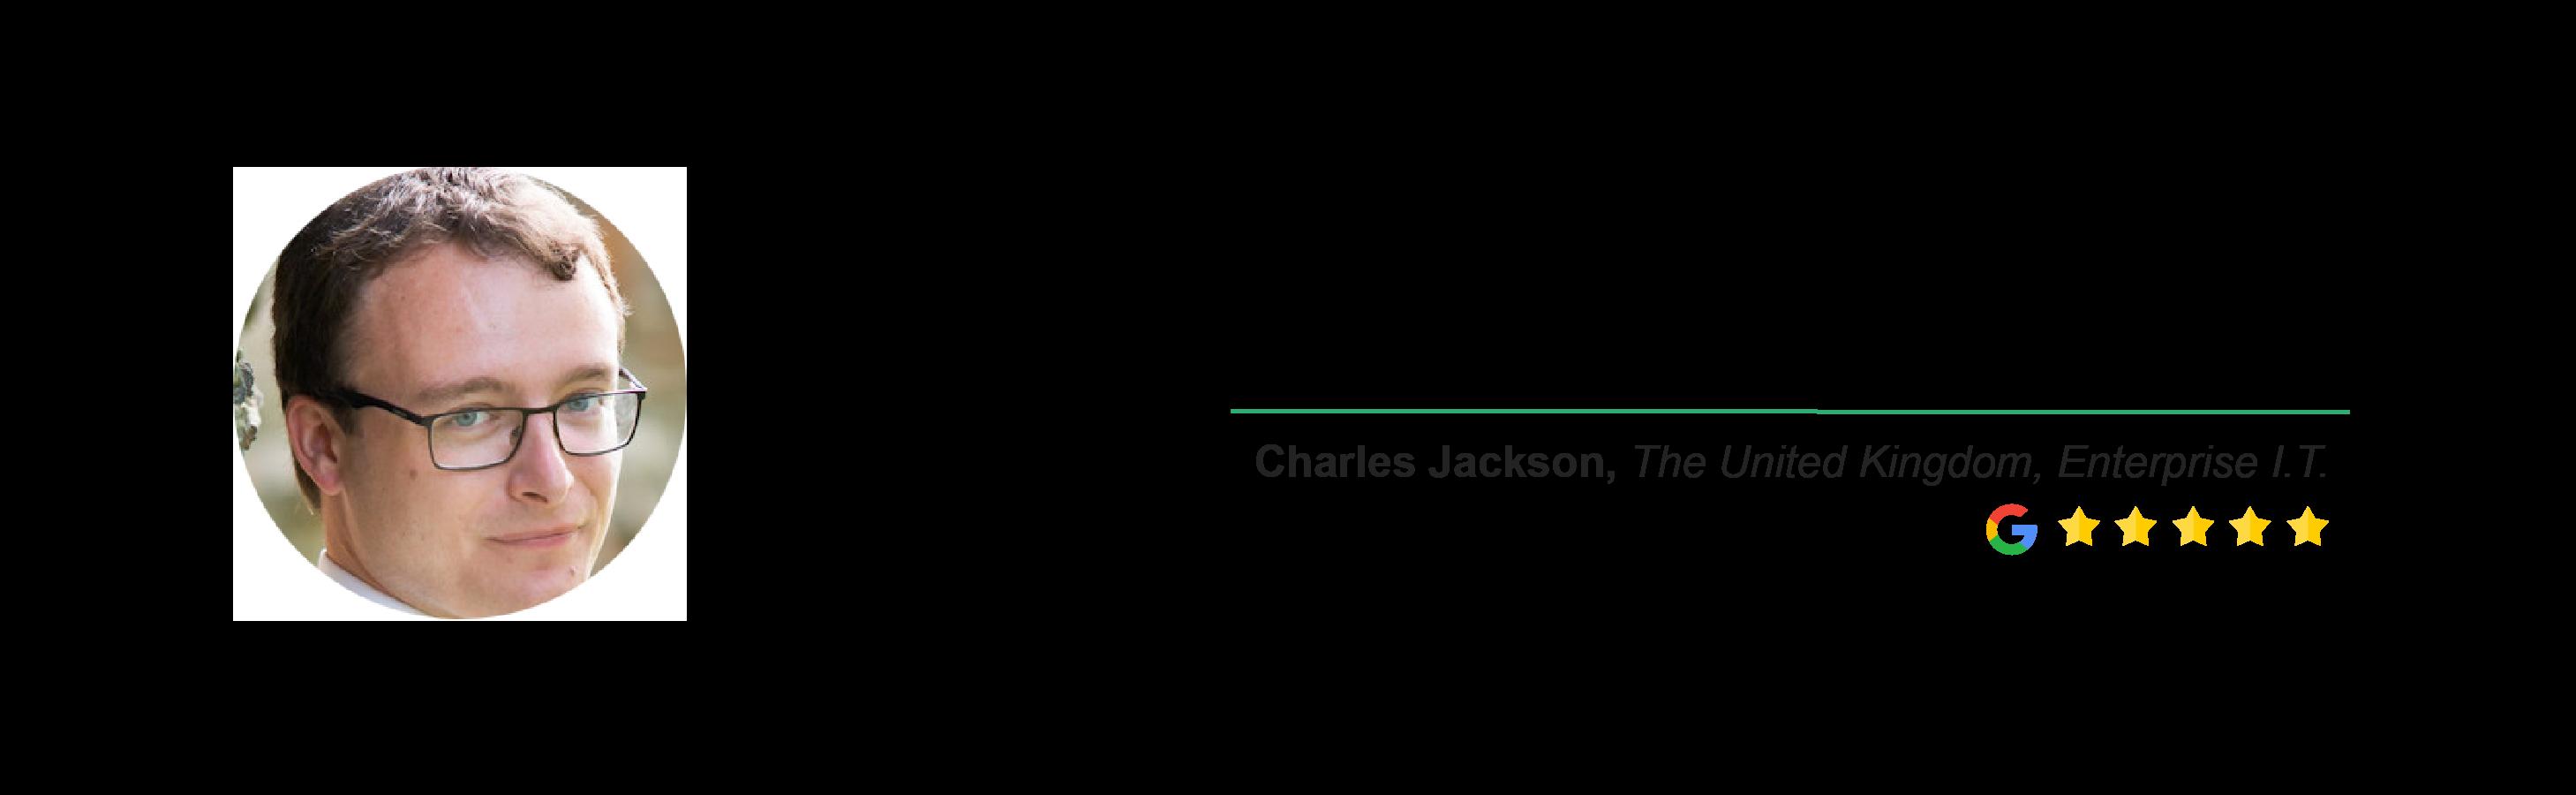 Locus Testimonial - Charles Jackson